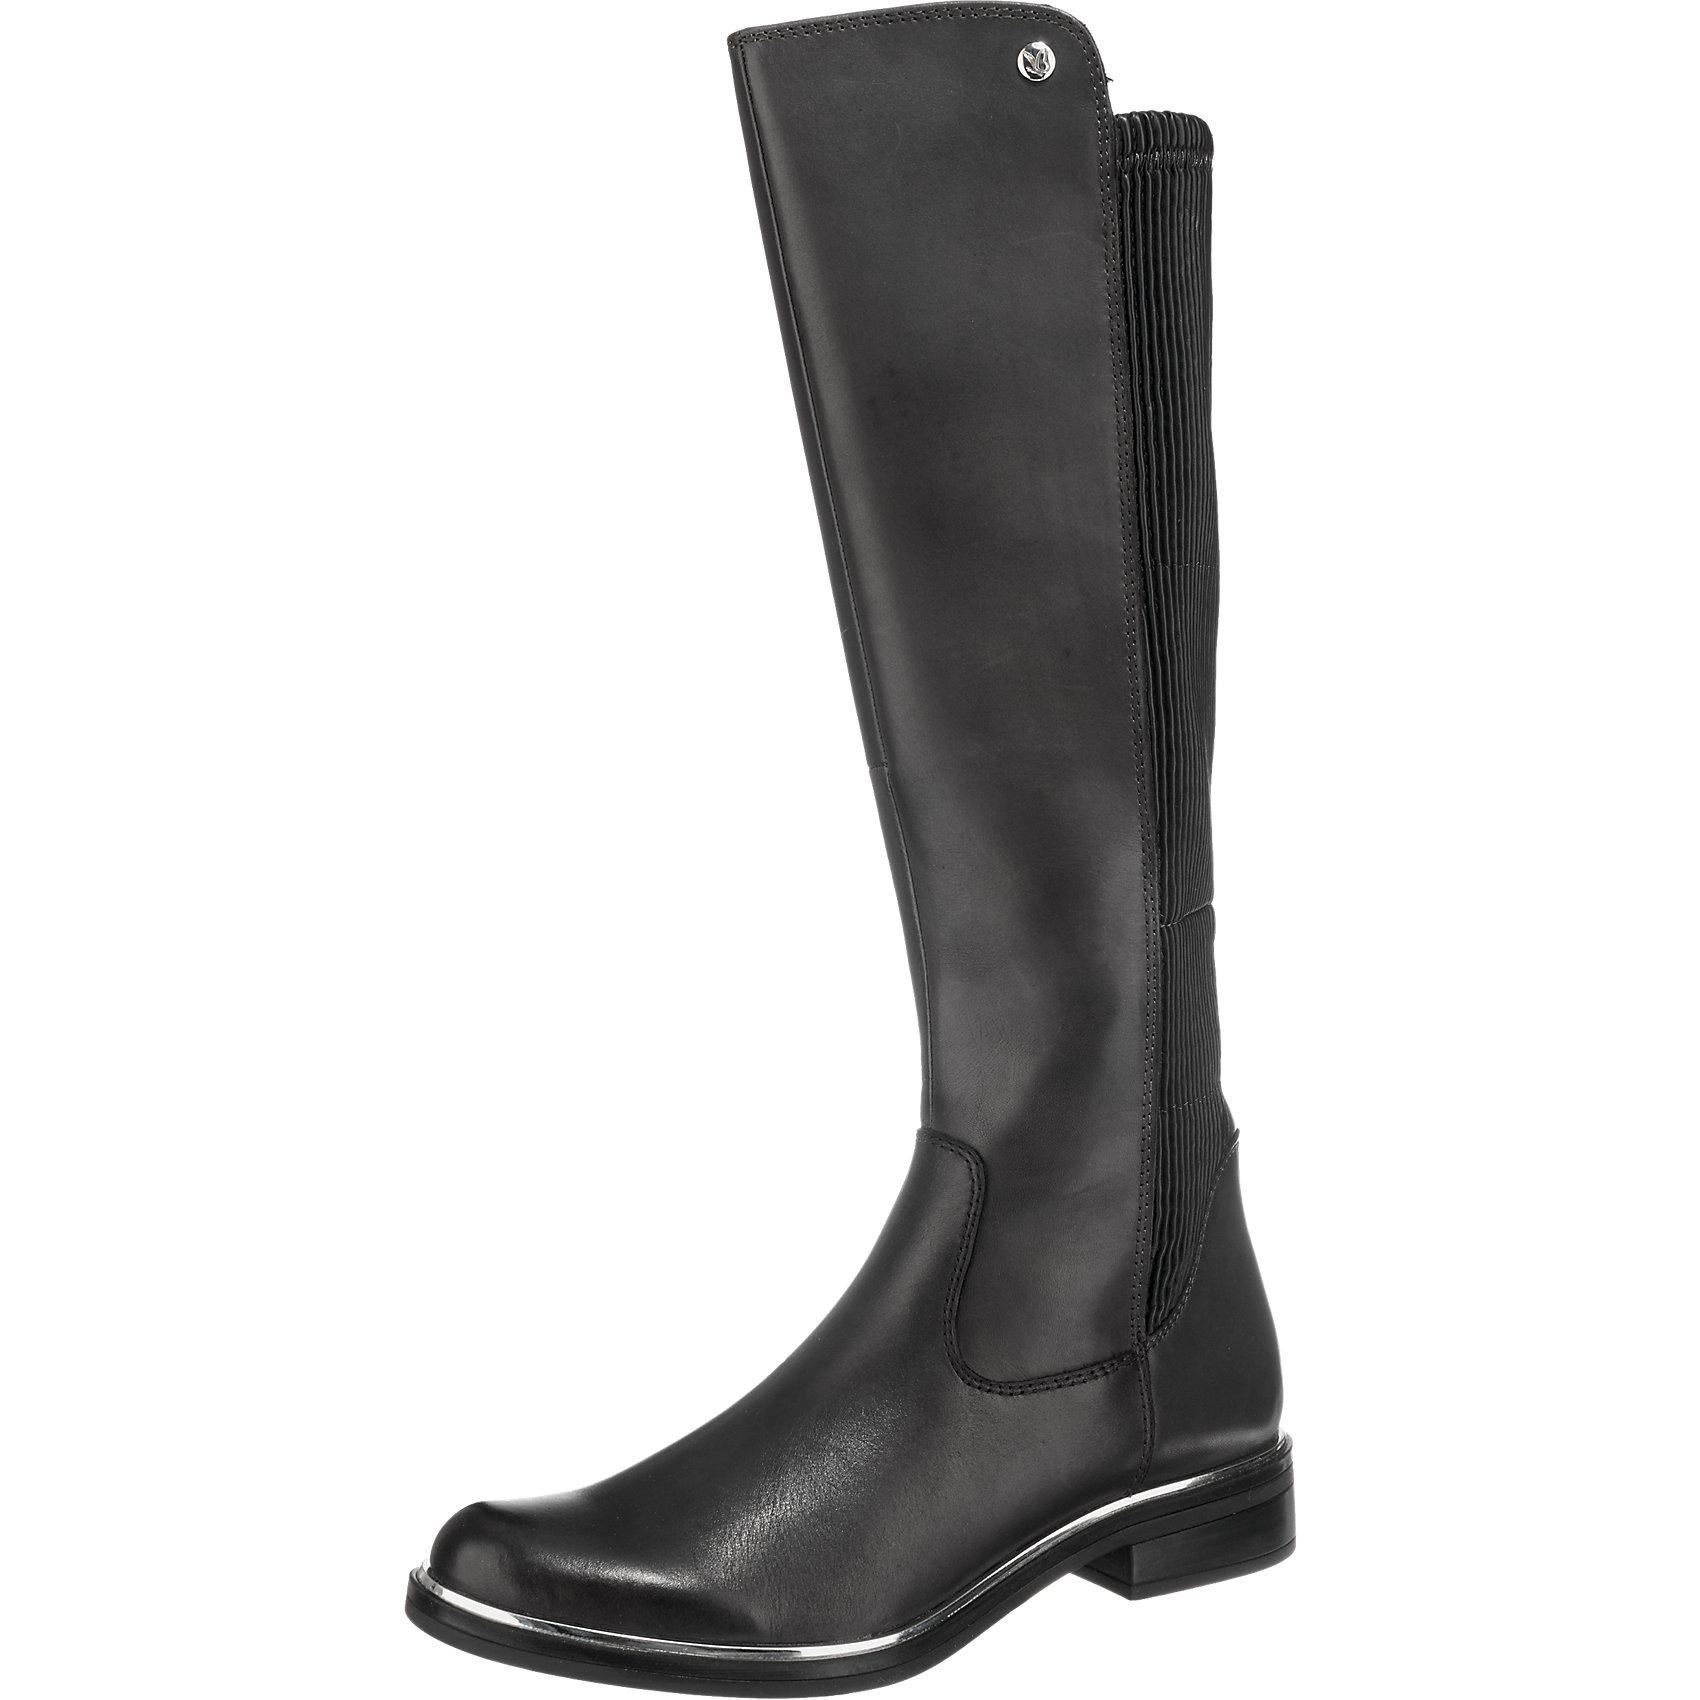 Neu CAPRICE Stiefel Stiefel CAPRICE grau 6960097 32de44